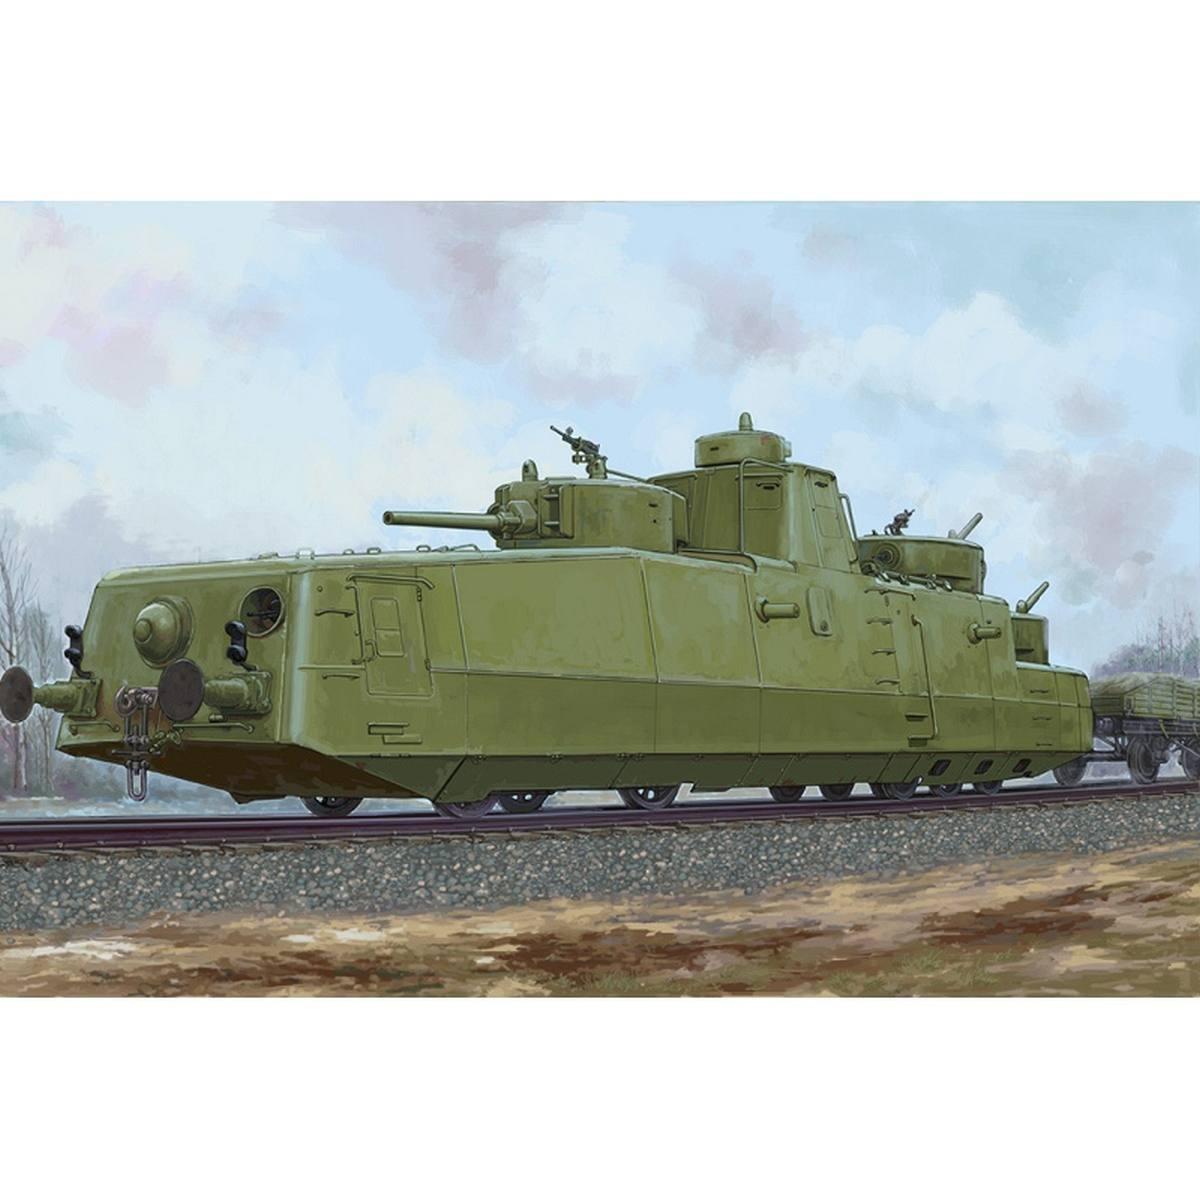 Hobby Boss Soviet MBV-2 Armored Train Late F-34 Gun Locomotive 1 72 Kit 85514